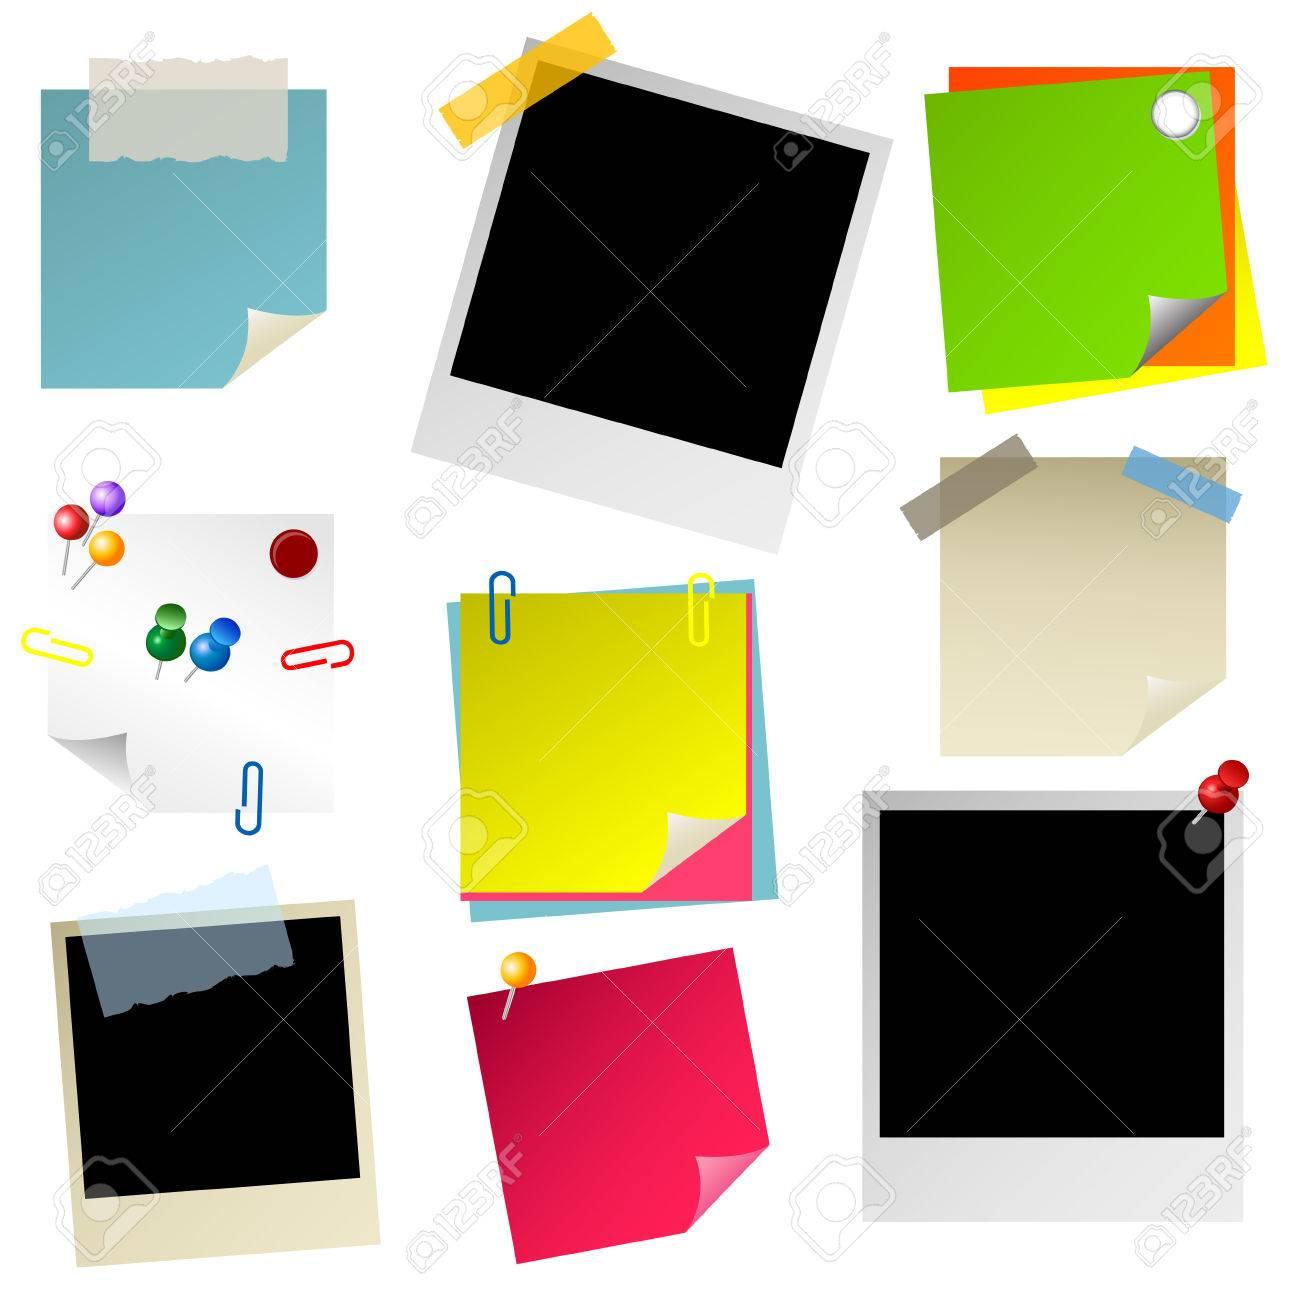 note, papier, sticker, postit, photo set Stock Vector - 8763921